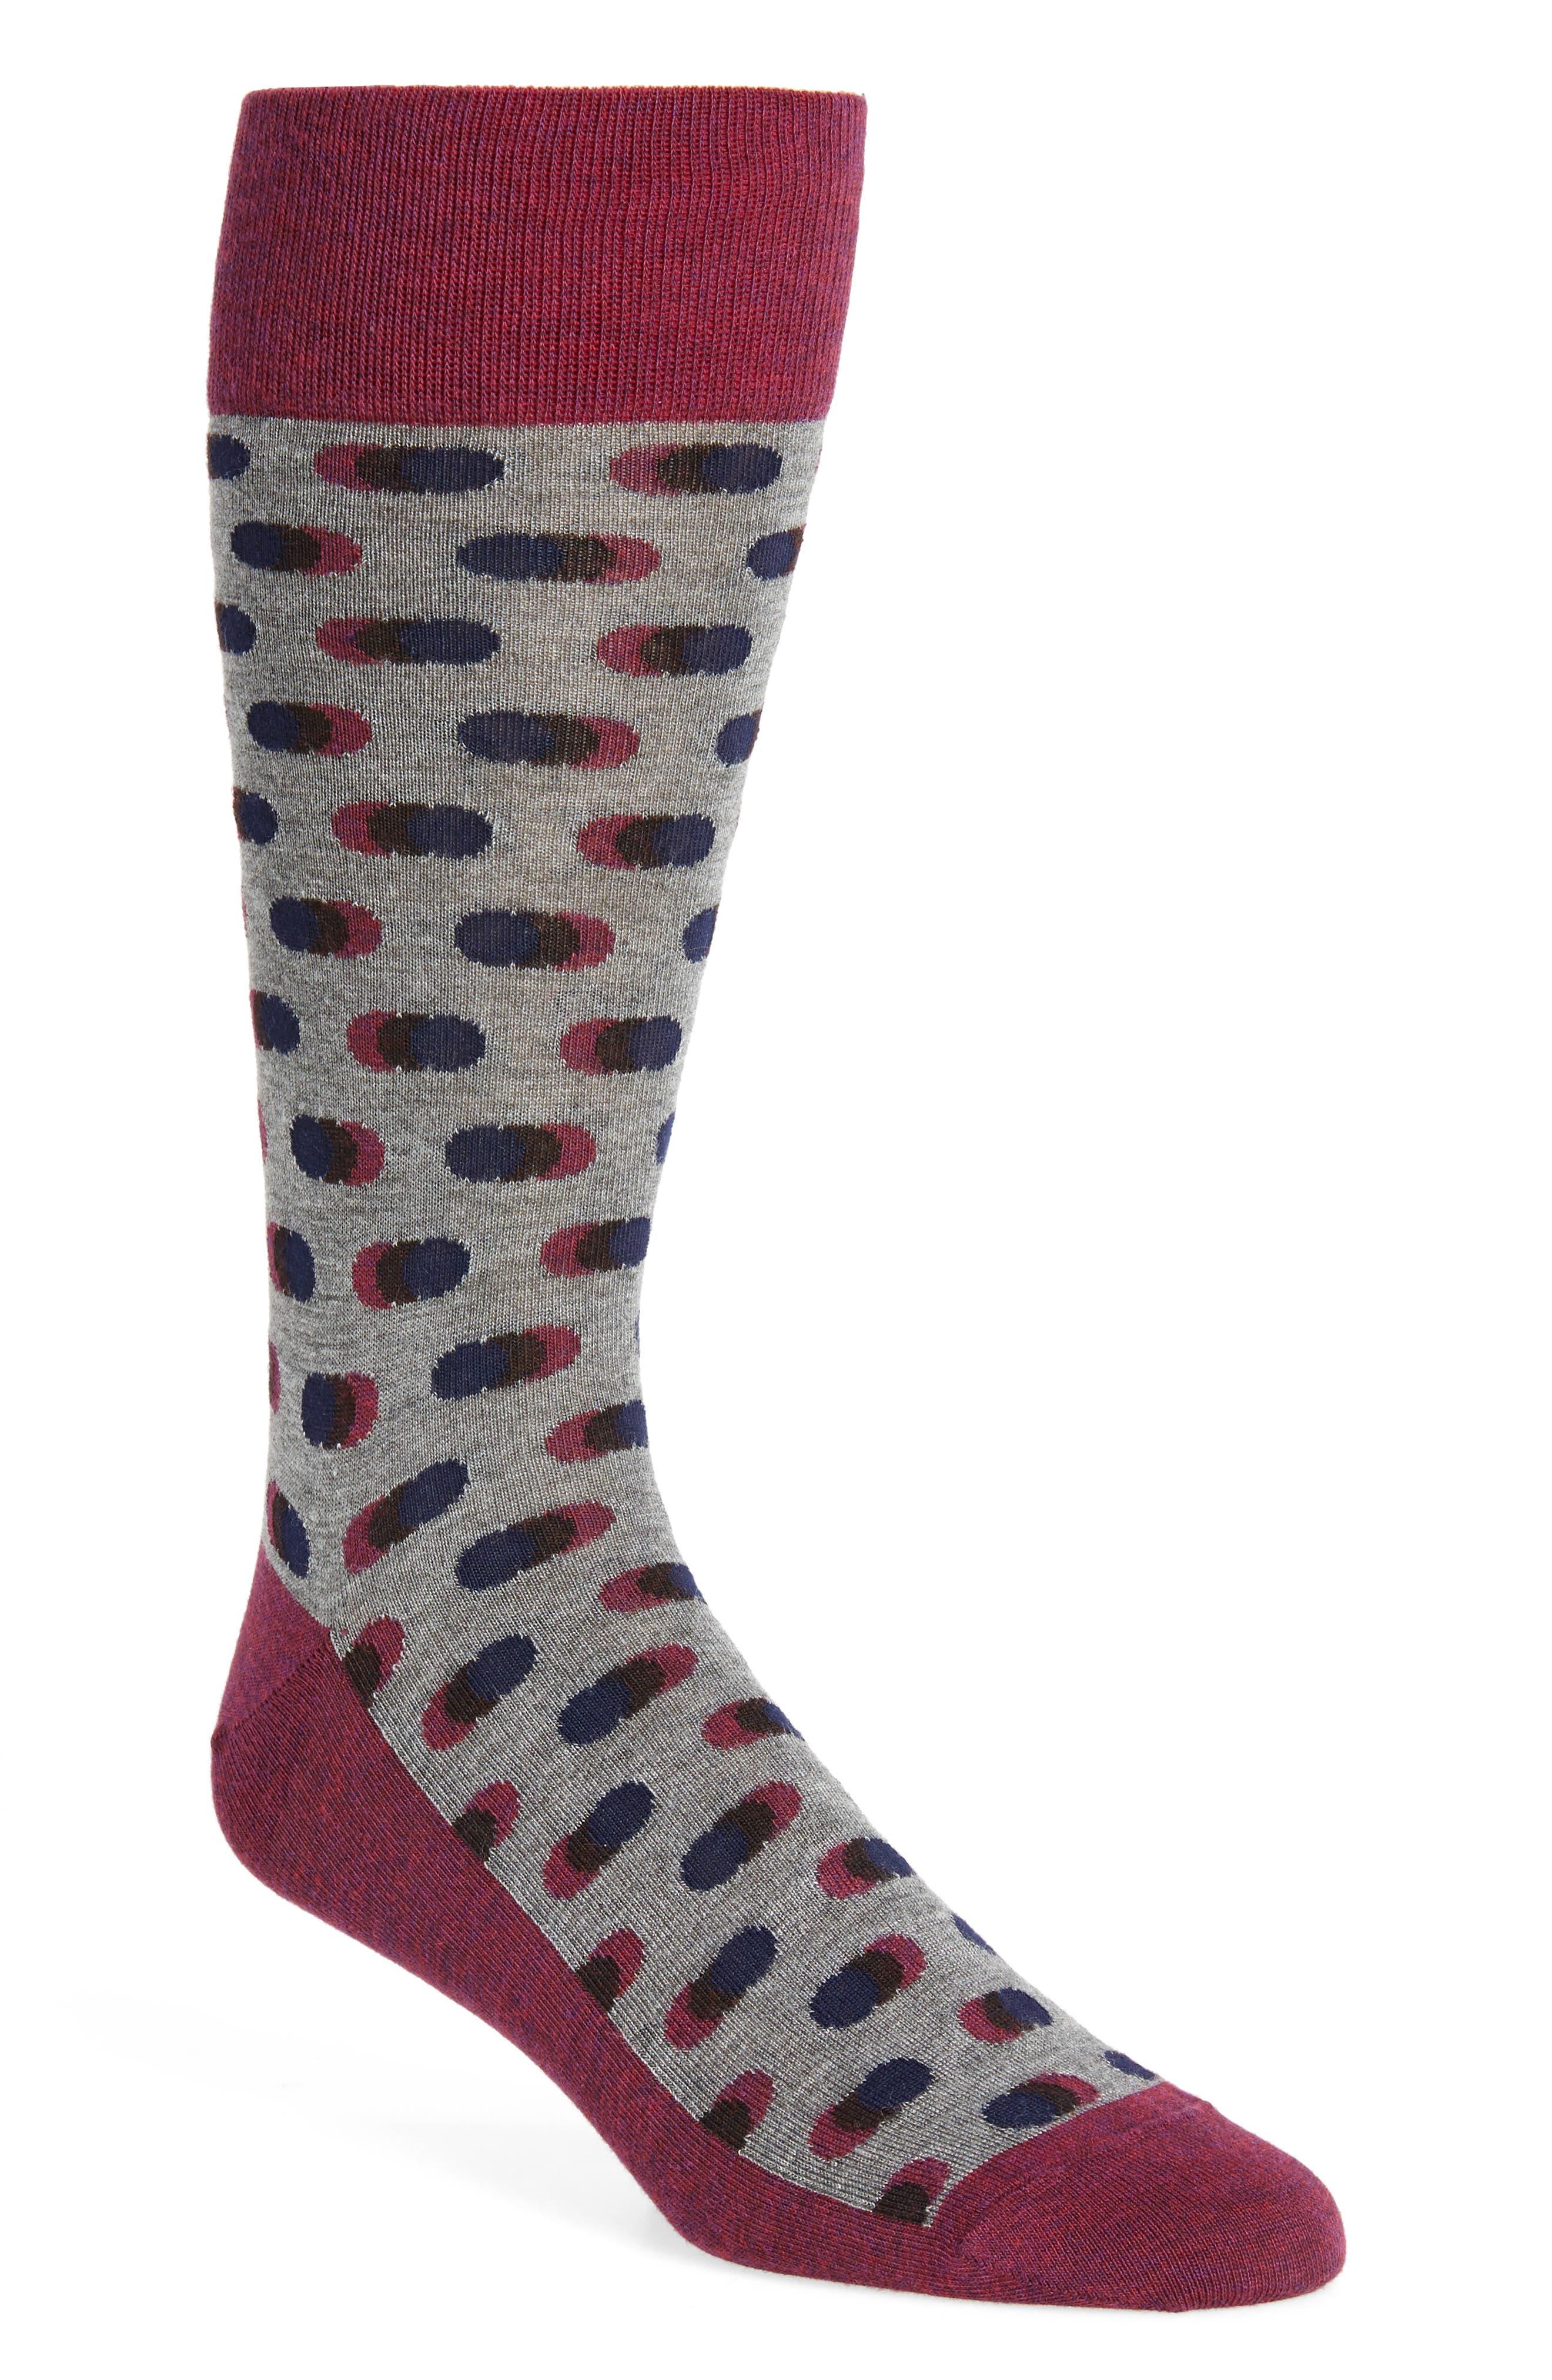 Calibrate Dot Socks